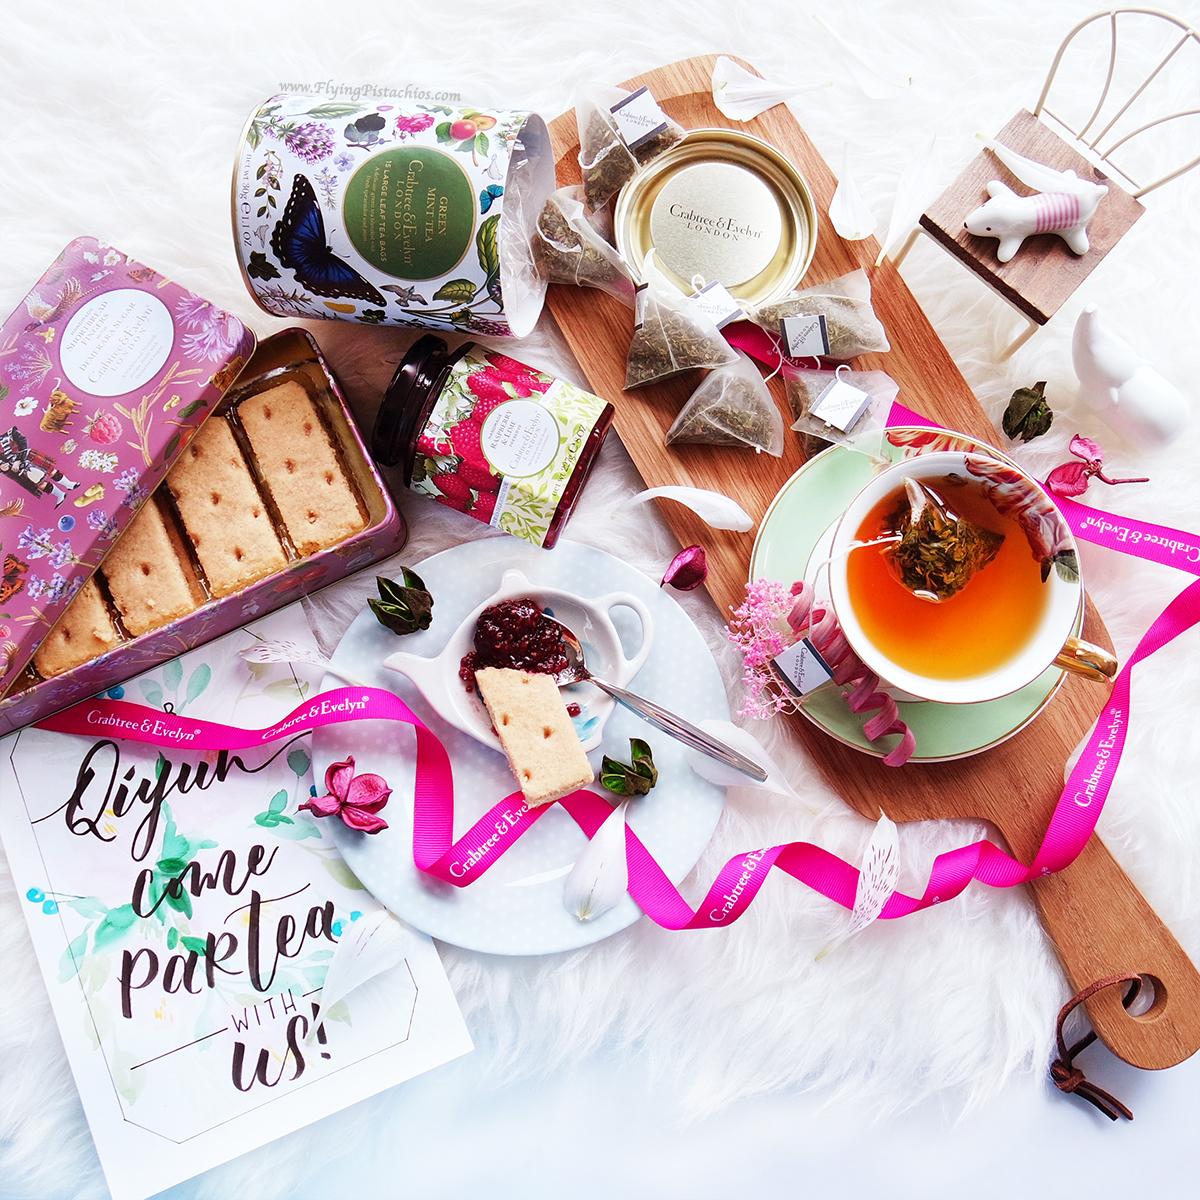 Crabtree & Evelyn Tea